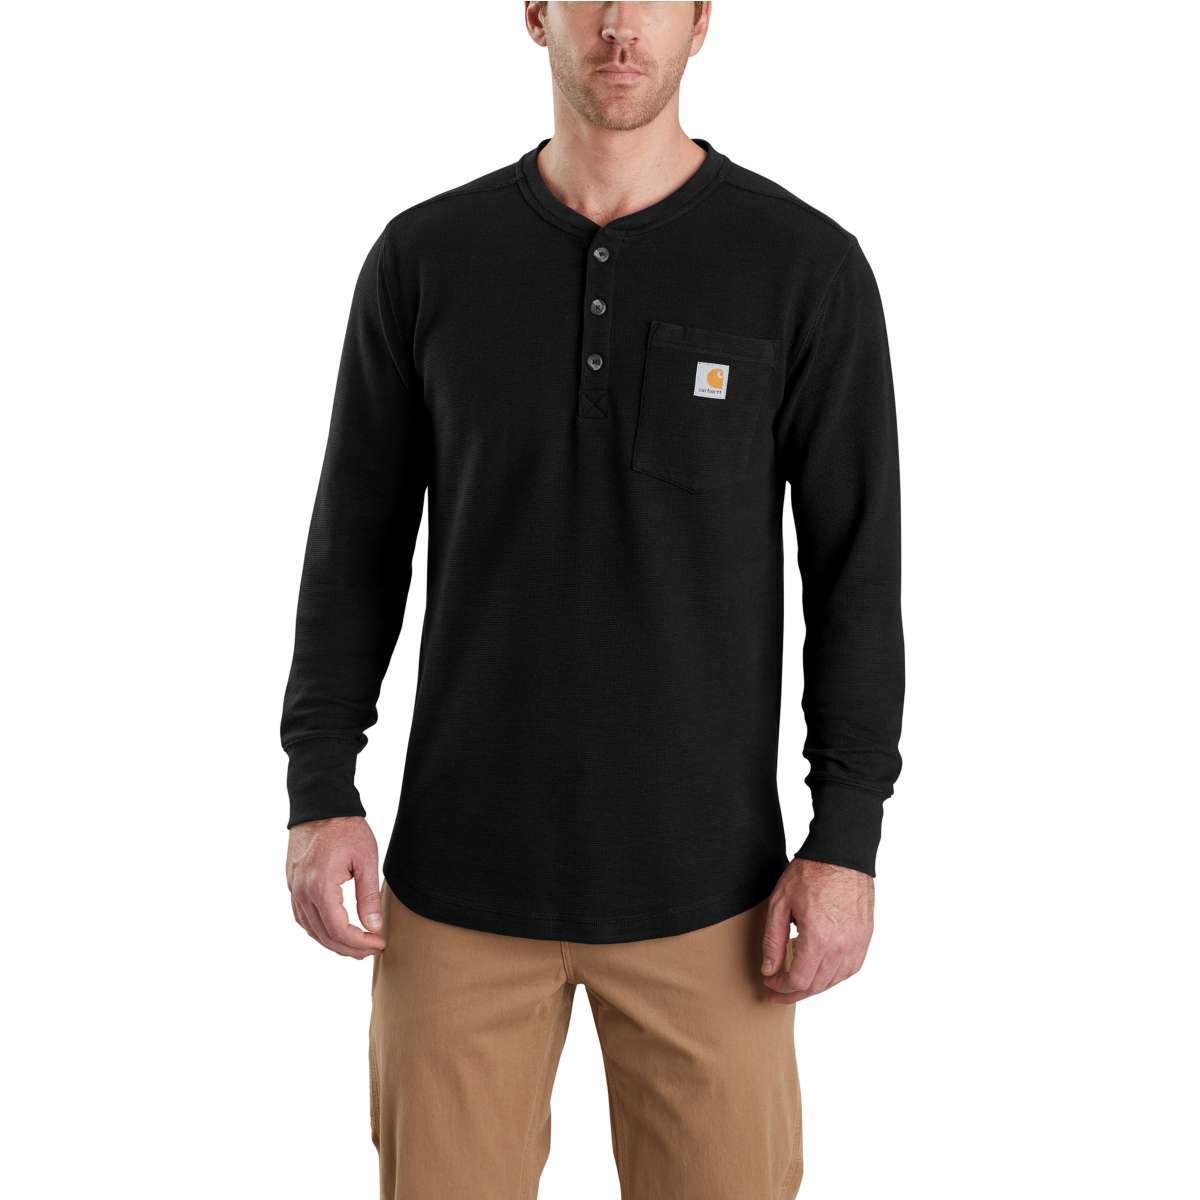 Carhartt Men's Tilden Long-Sleeve Henley Shirt - Black, M